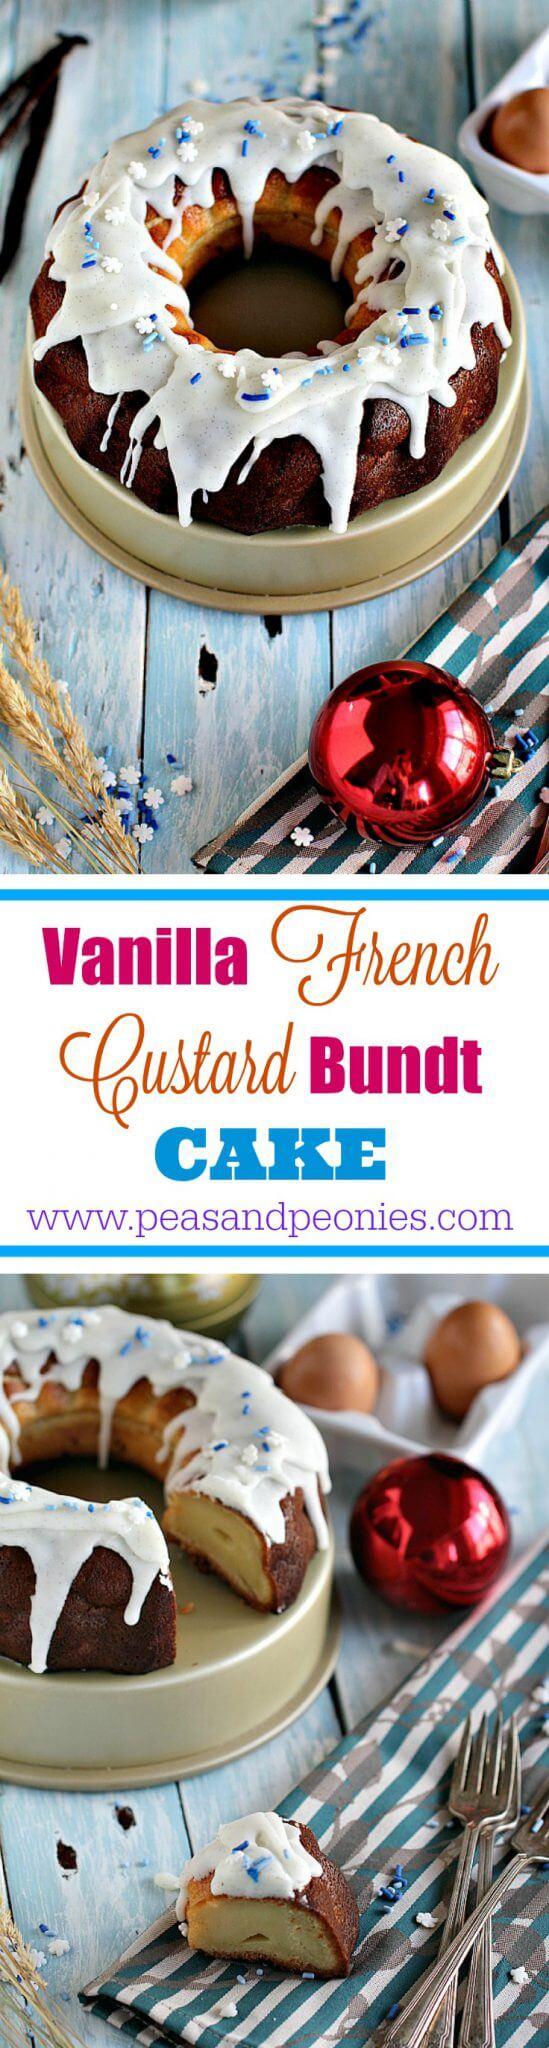 Vanilla French Custard Bundt Cake